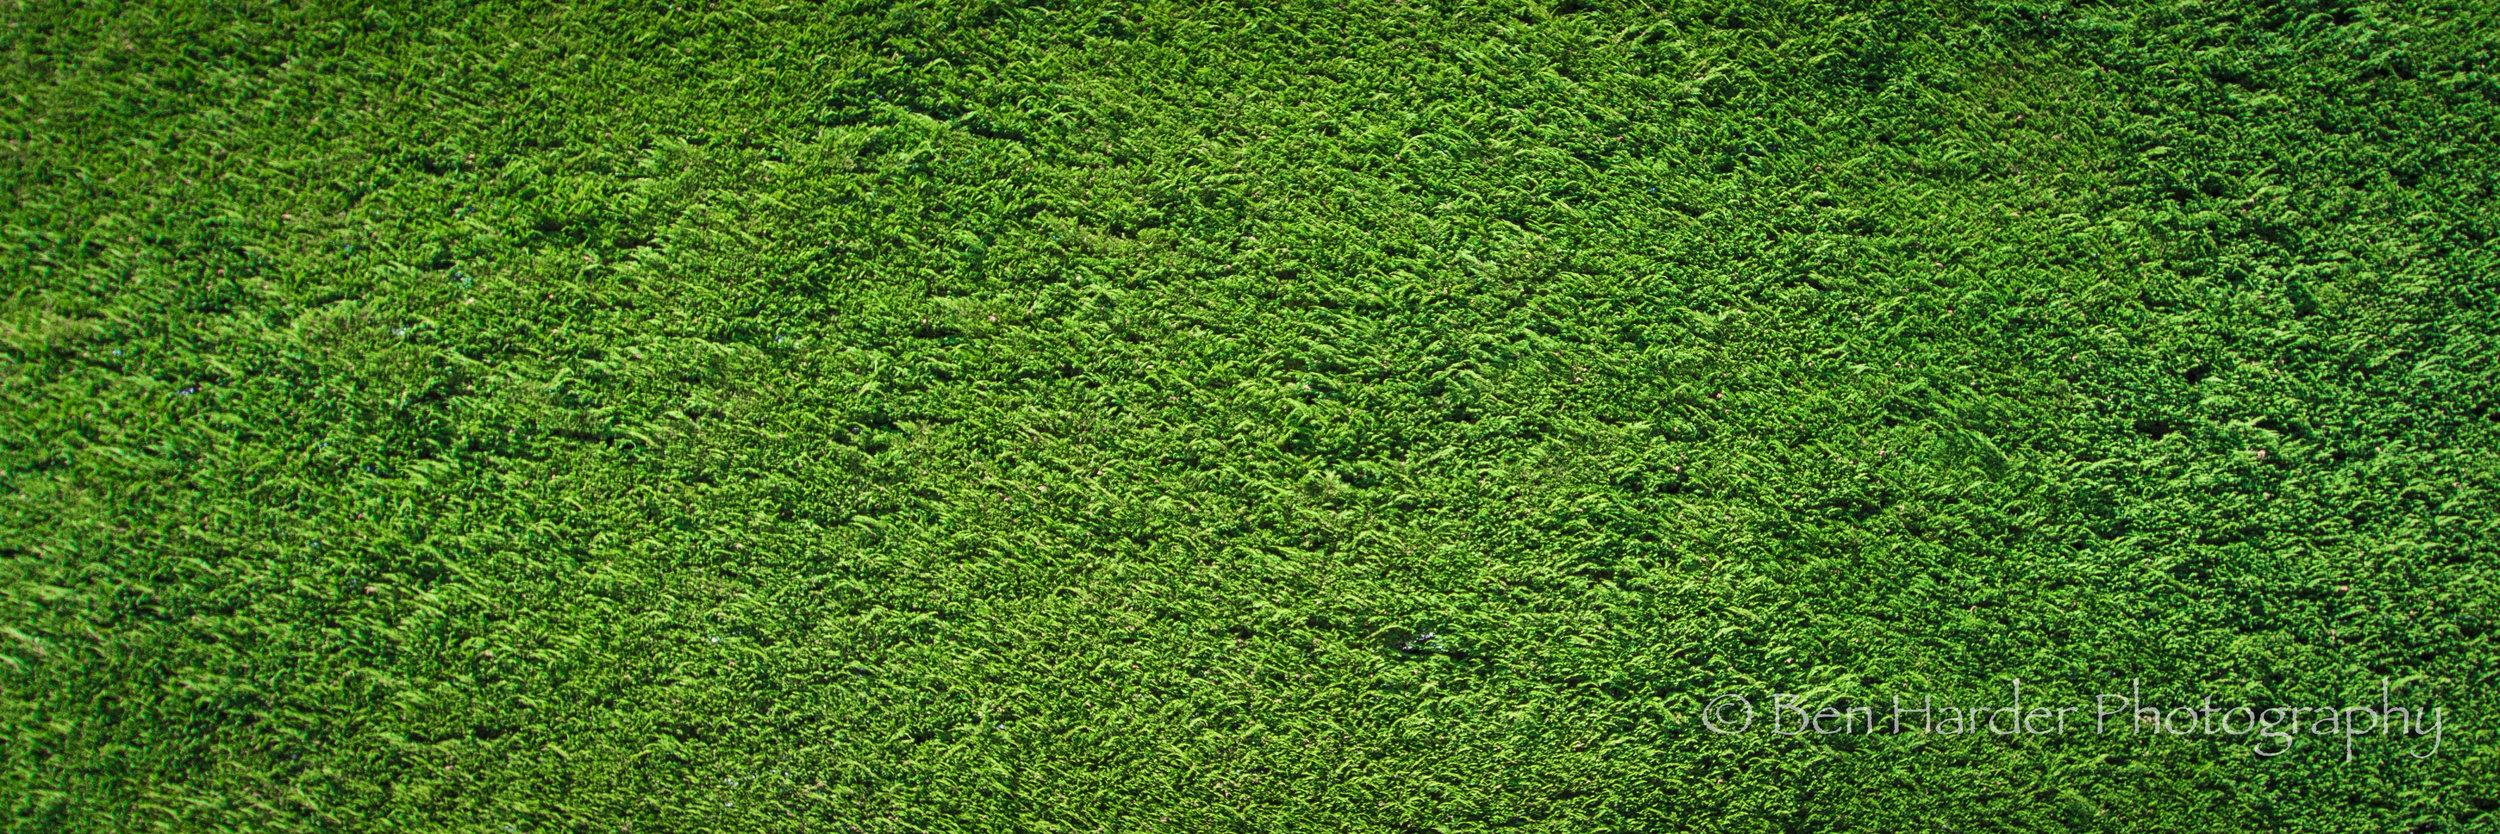 """Hedge"" - Buchart Gardens, BC, Canada"